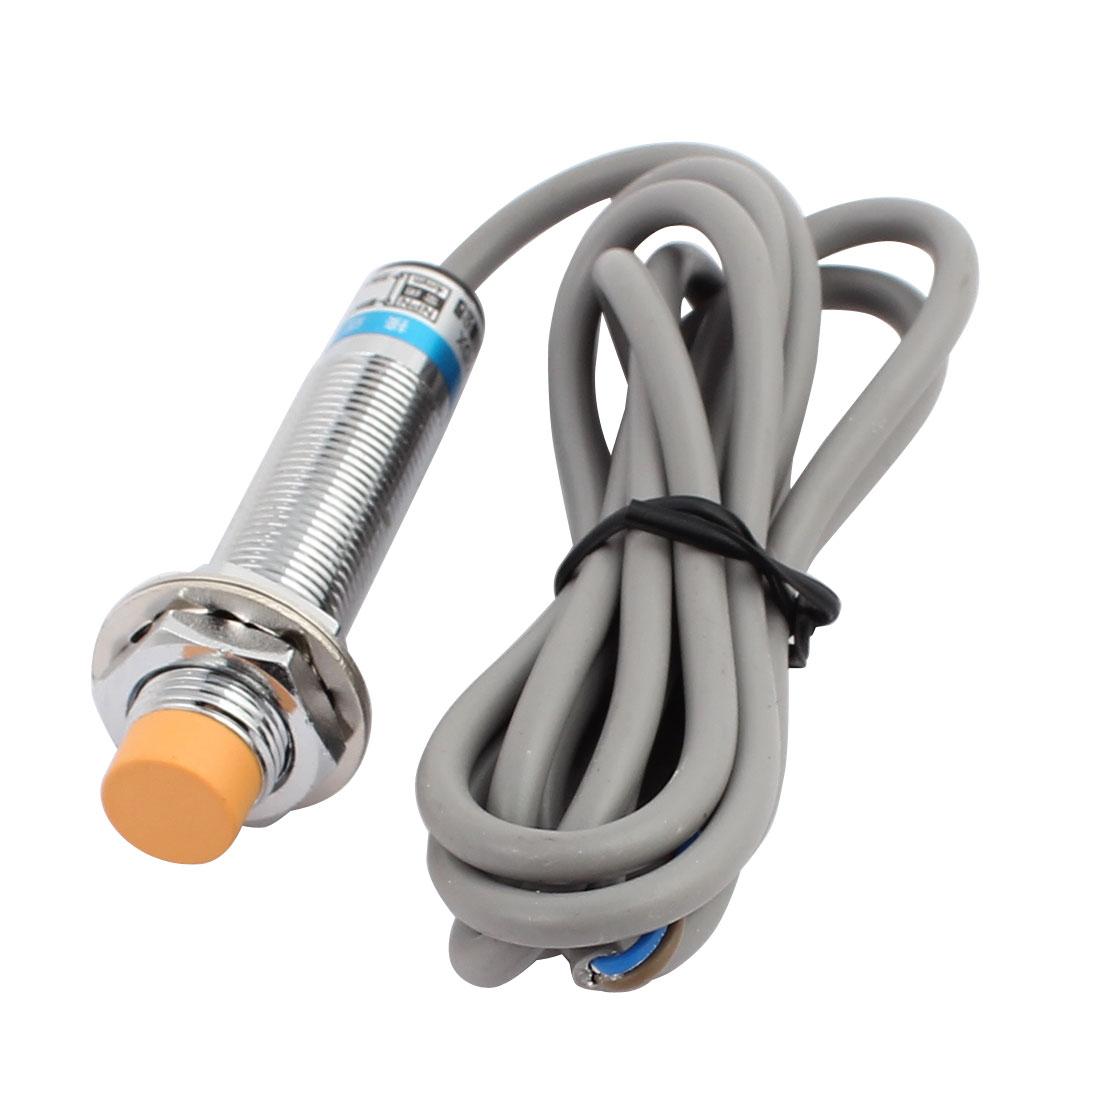 LJ12A3-4-Z/DX DC 6-36V 100mA NPN NC 4mm Inductive Proximity Sensor Switch 2-wire